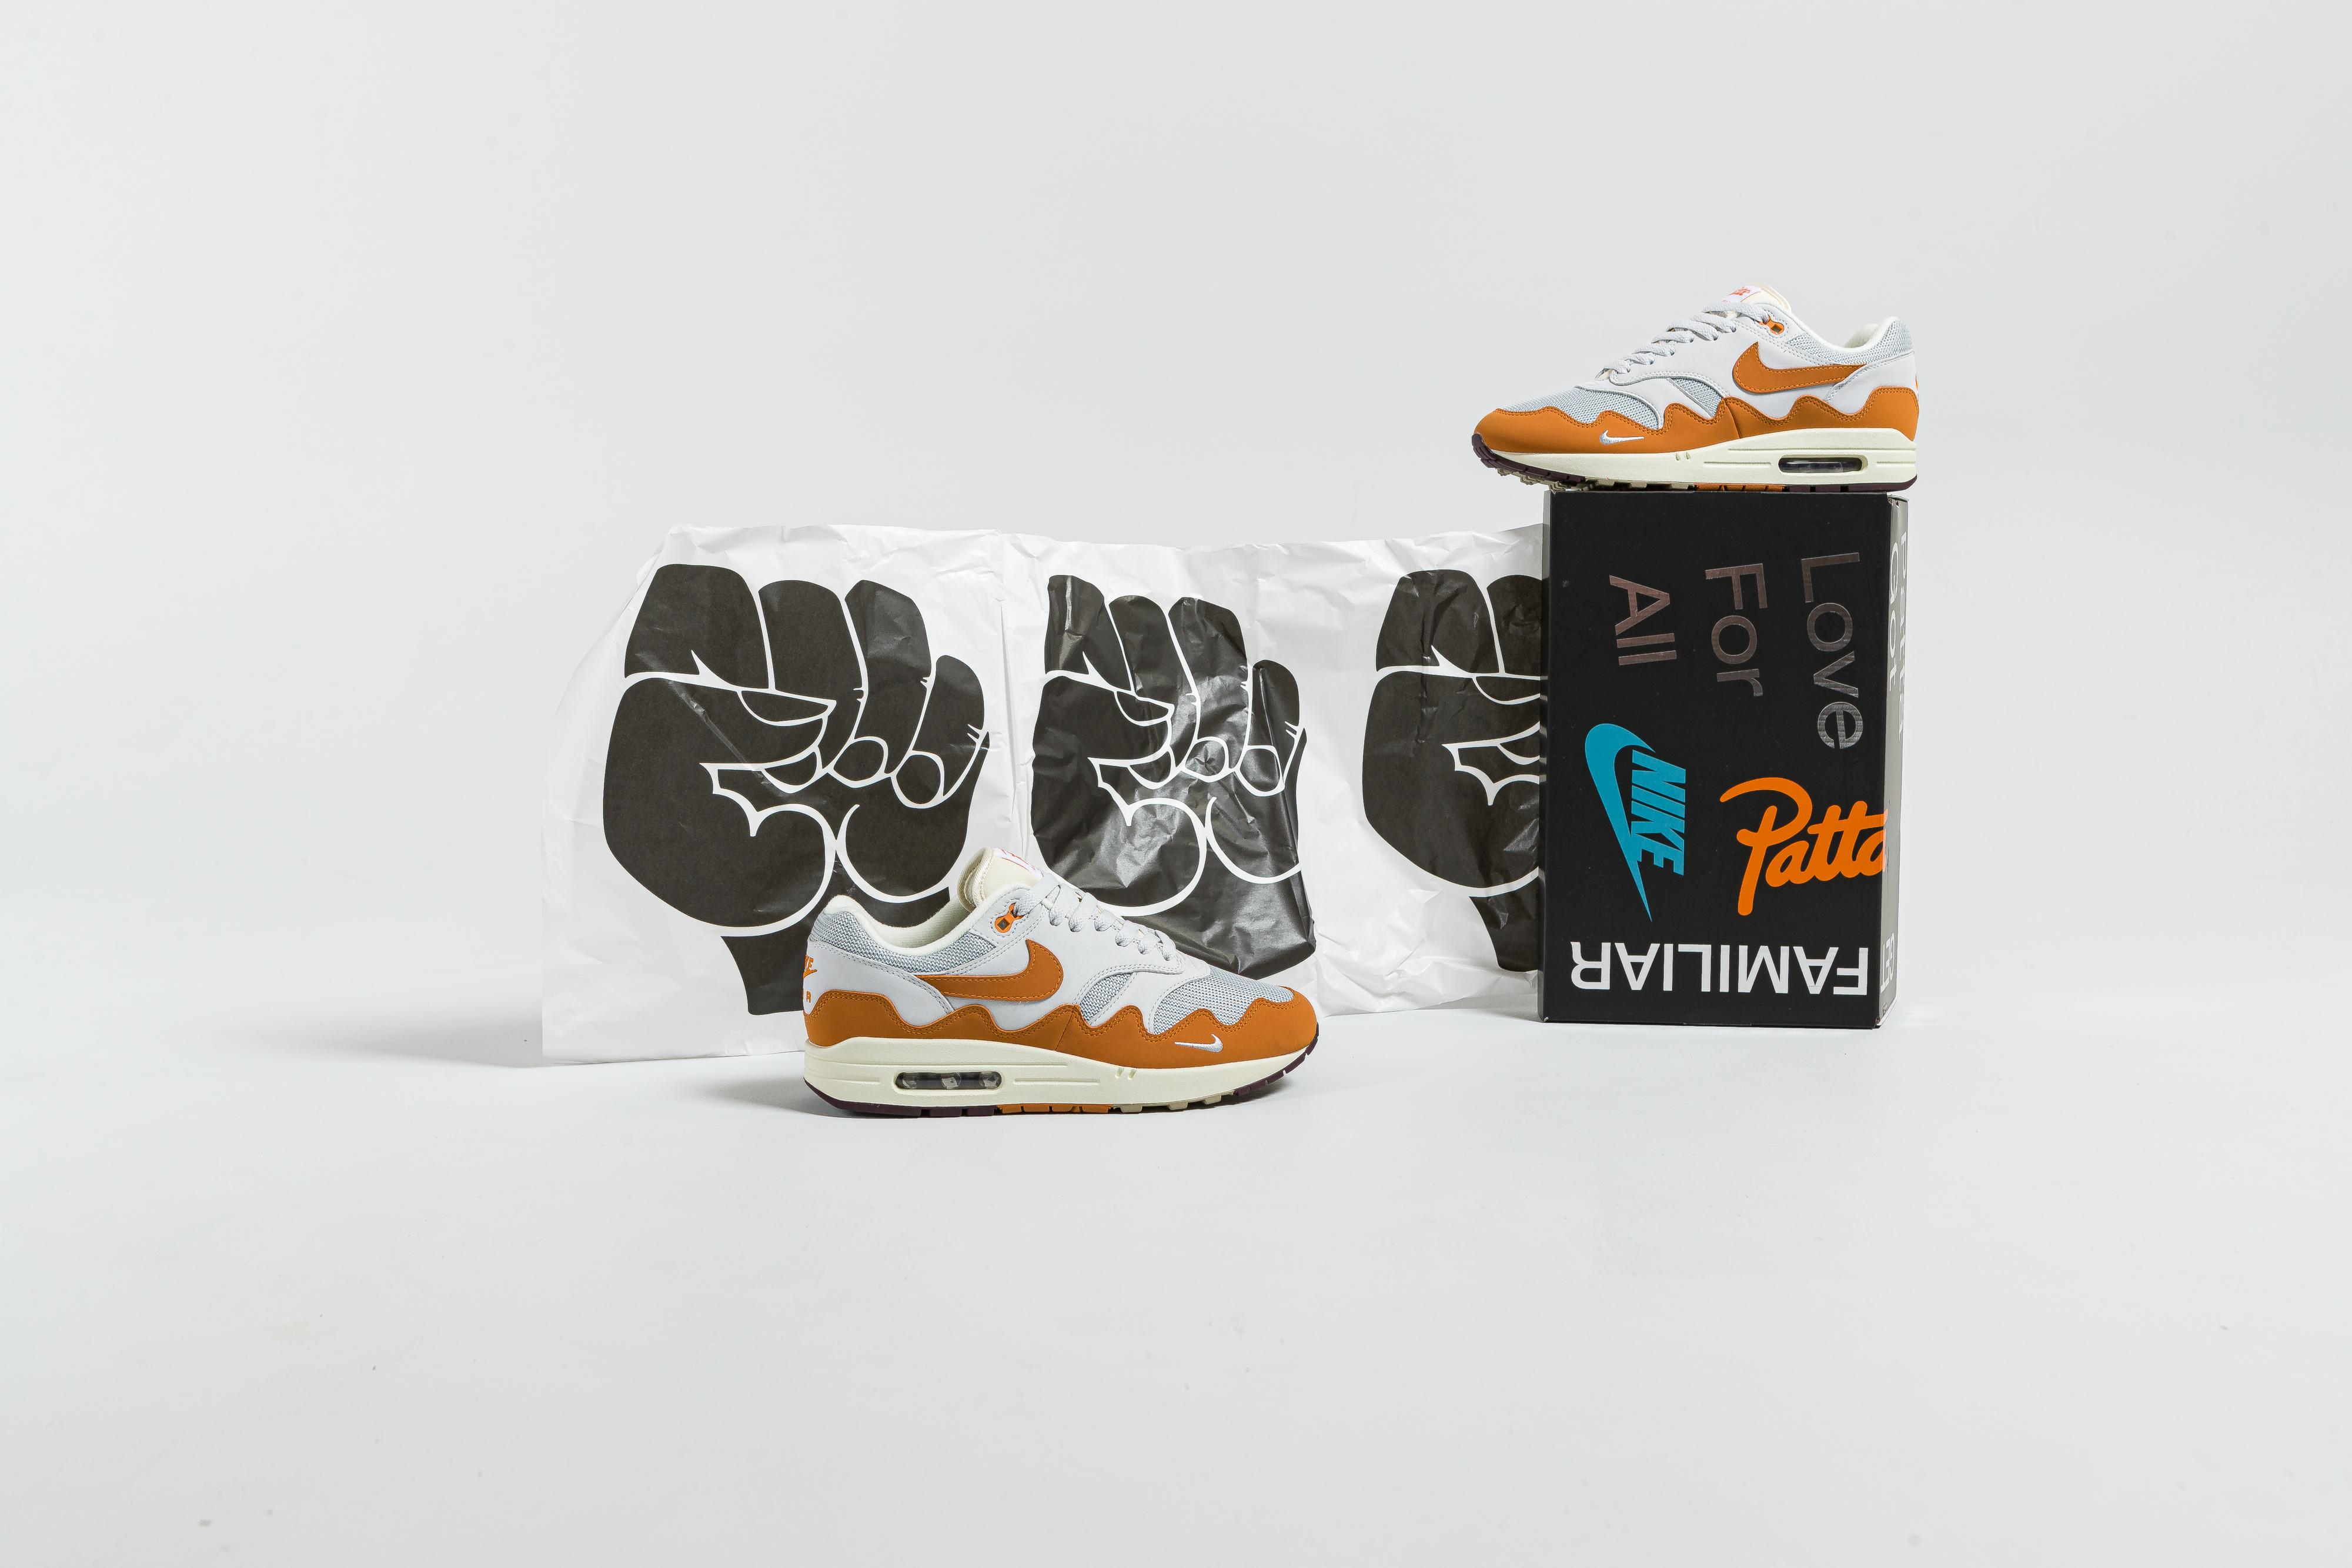 Nike - Air Max 1 x Patta - Metallic Silver/Monarch-Pure Platinum - Up There